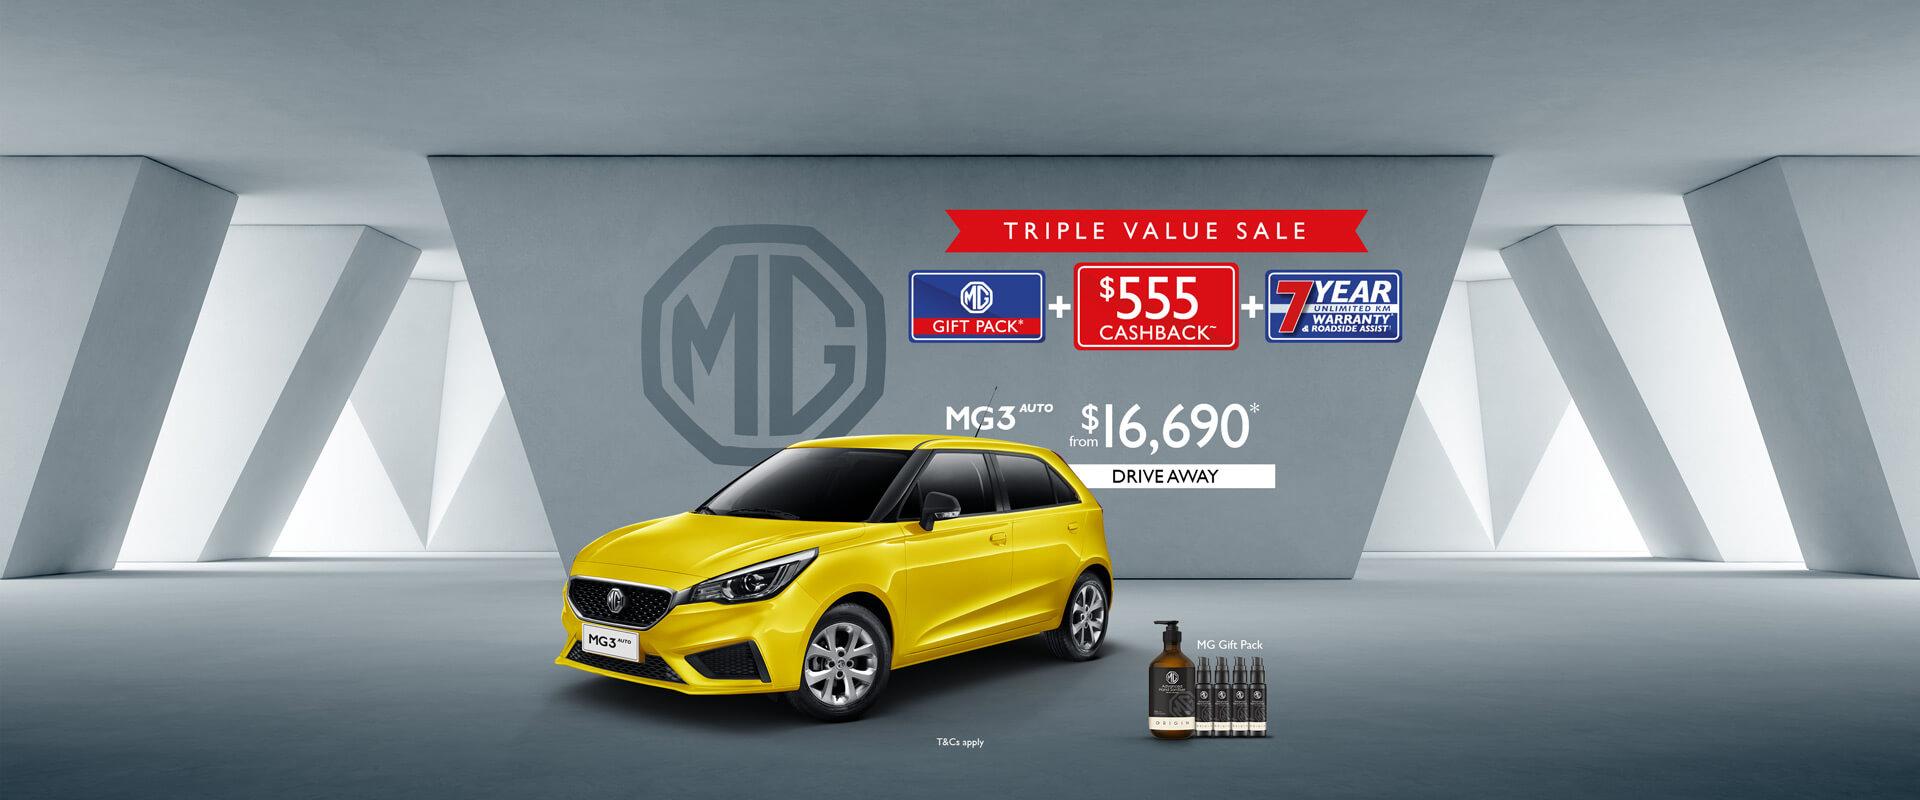 MG MG3 Triple Value Sale